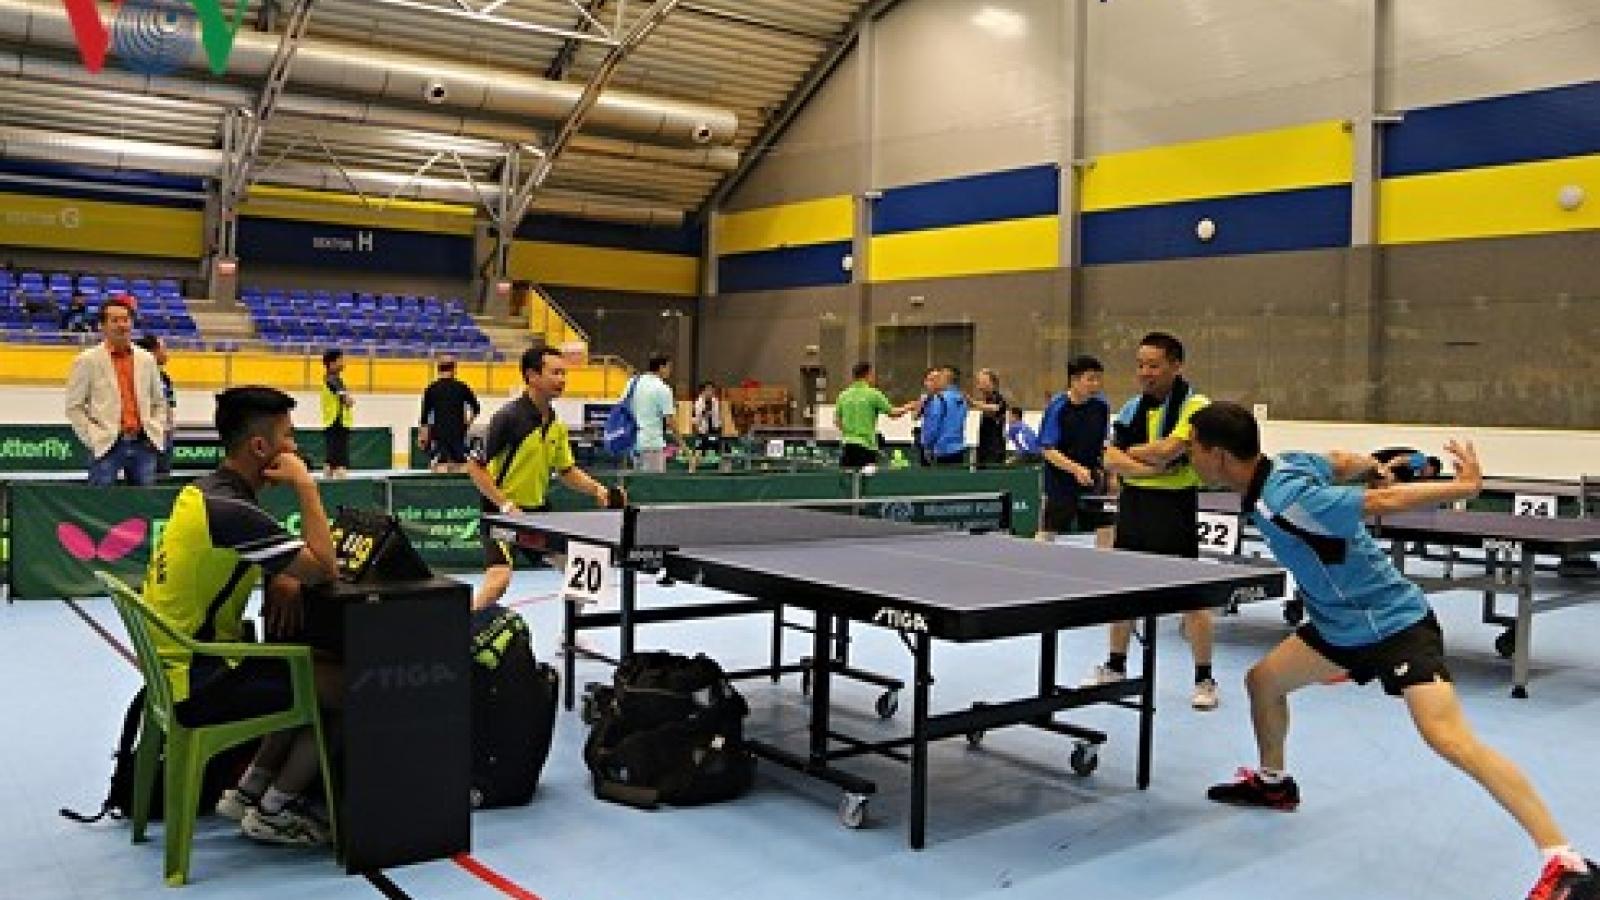 OVs host table tennis tourney in Czech Republic